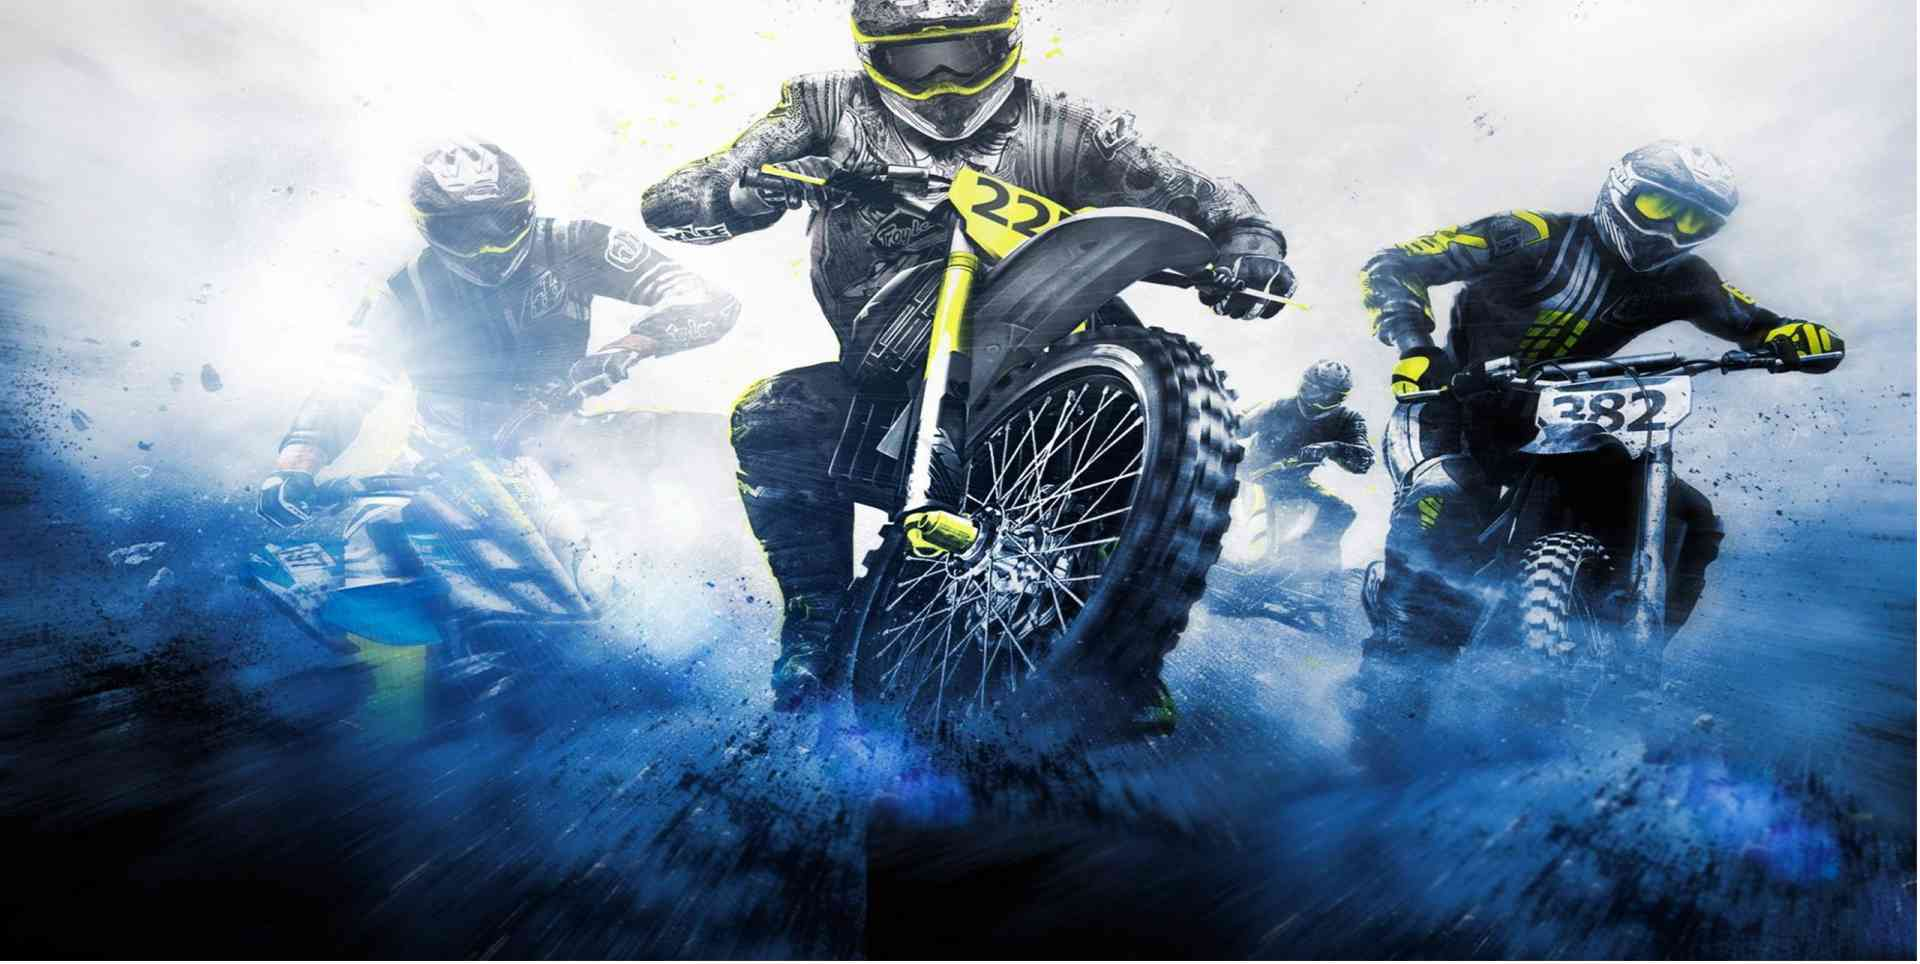 MXGP of Sweden 2020 Live Stream